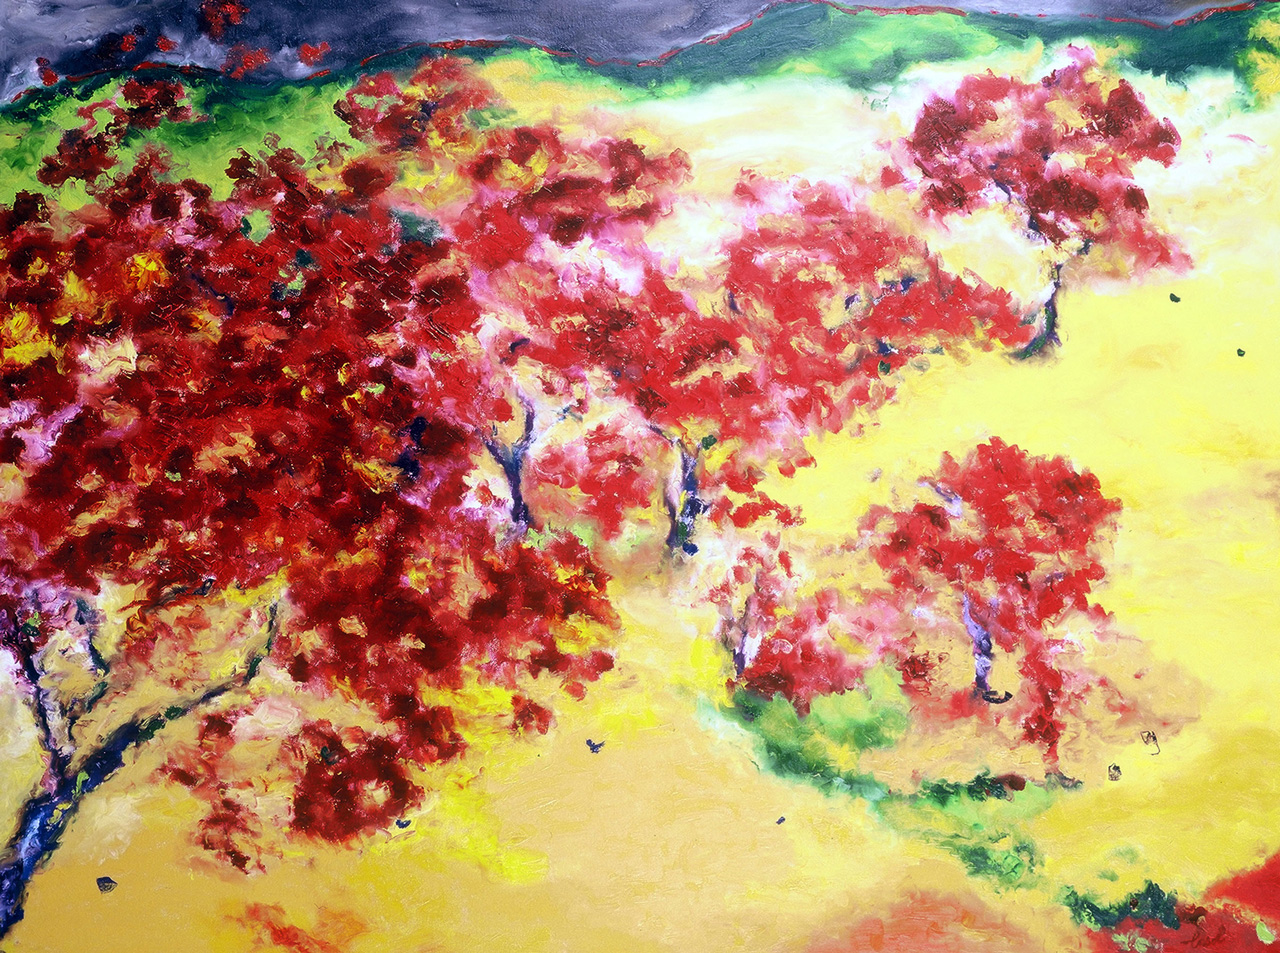 Maryse Casol, Cerisiers en Fleurs painting, 2005